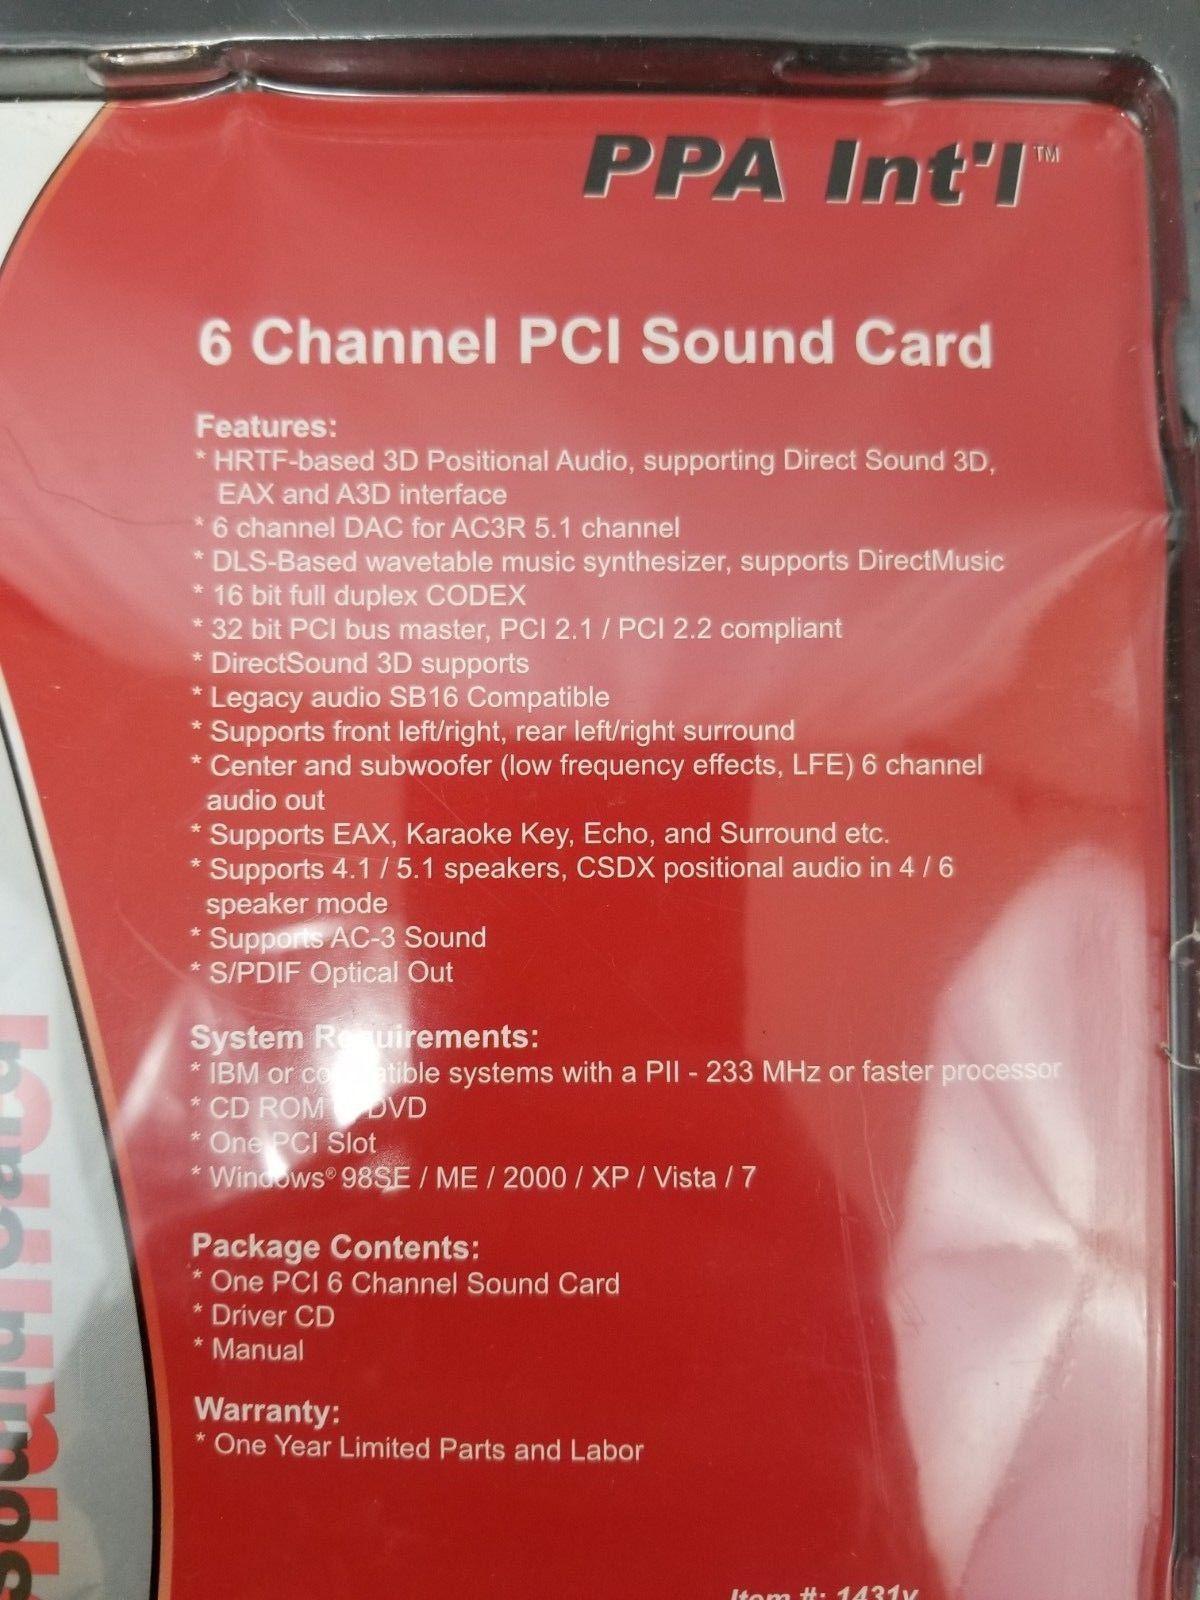 PPA INT'L 1431V Sound Card 6 Channel PCI 96kHz 16 Bit Sound Card PCI Bus Master image 3